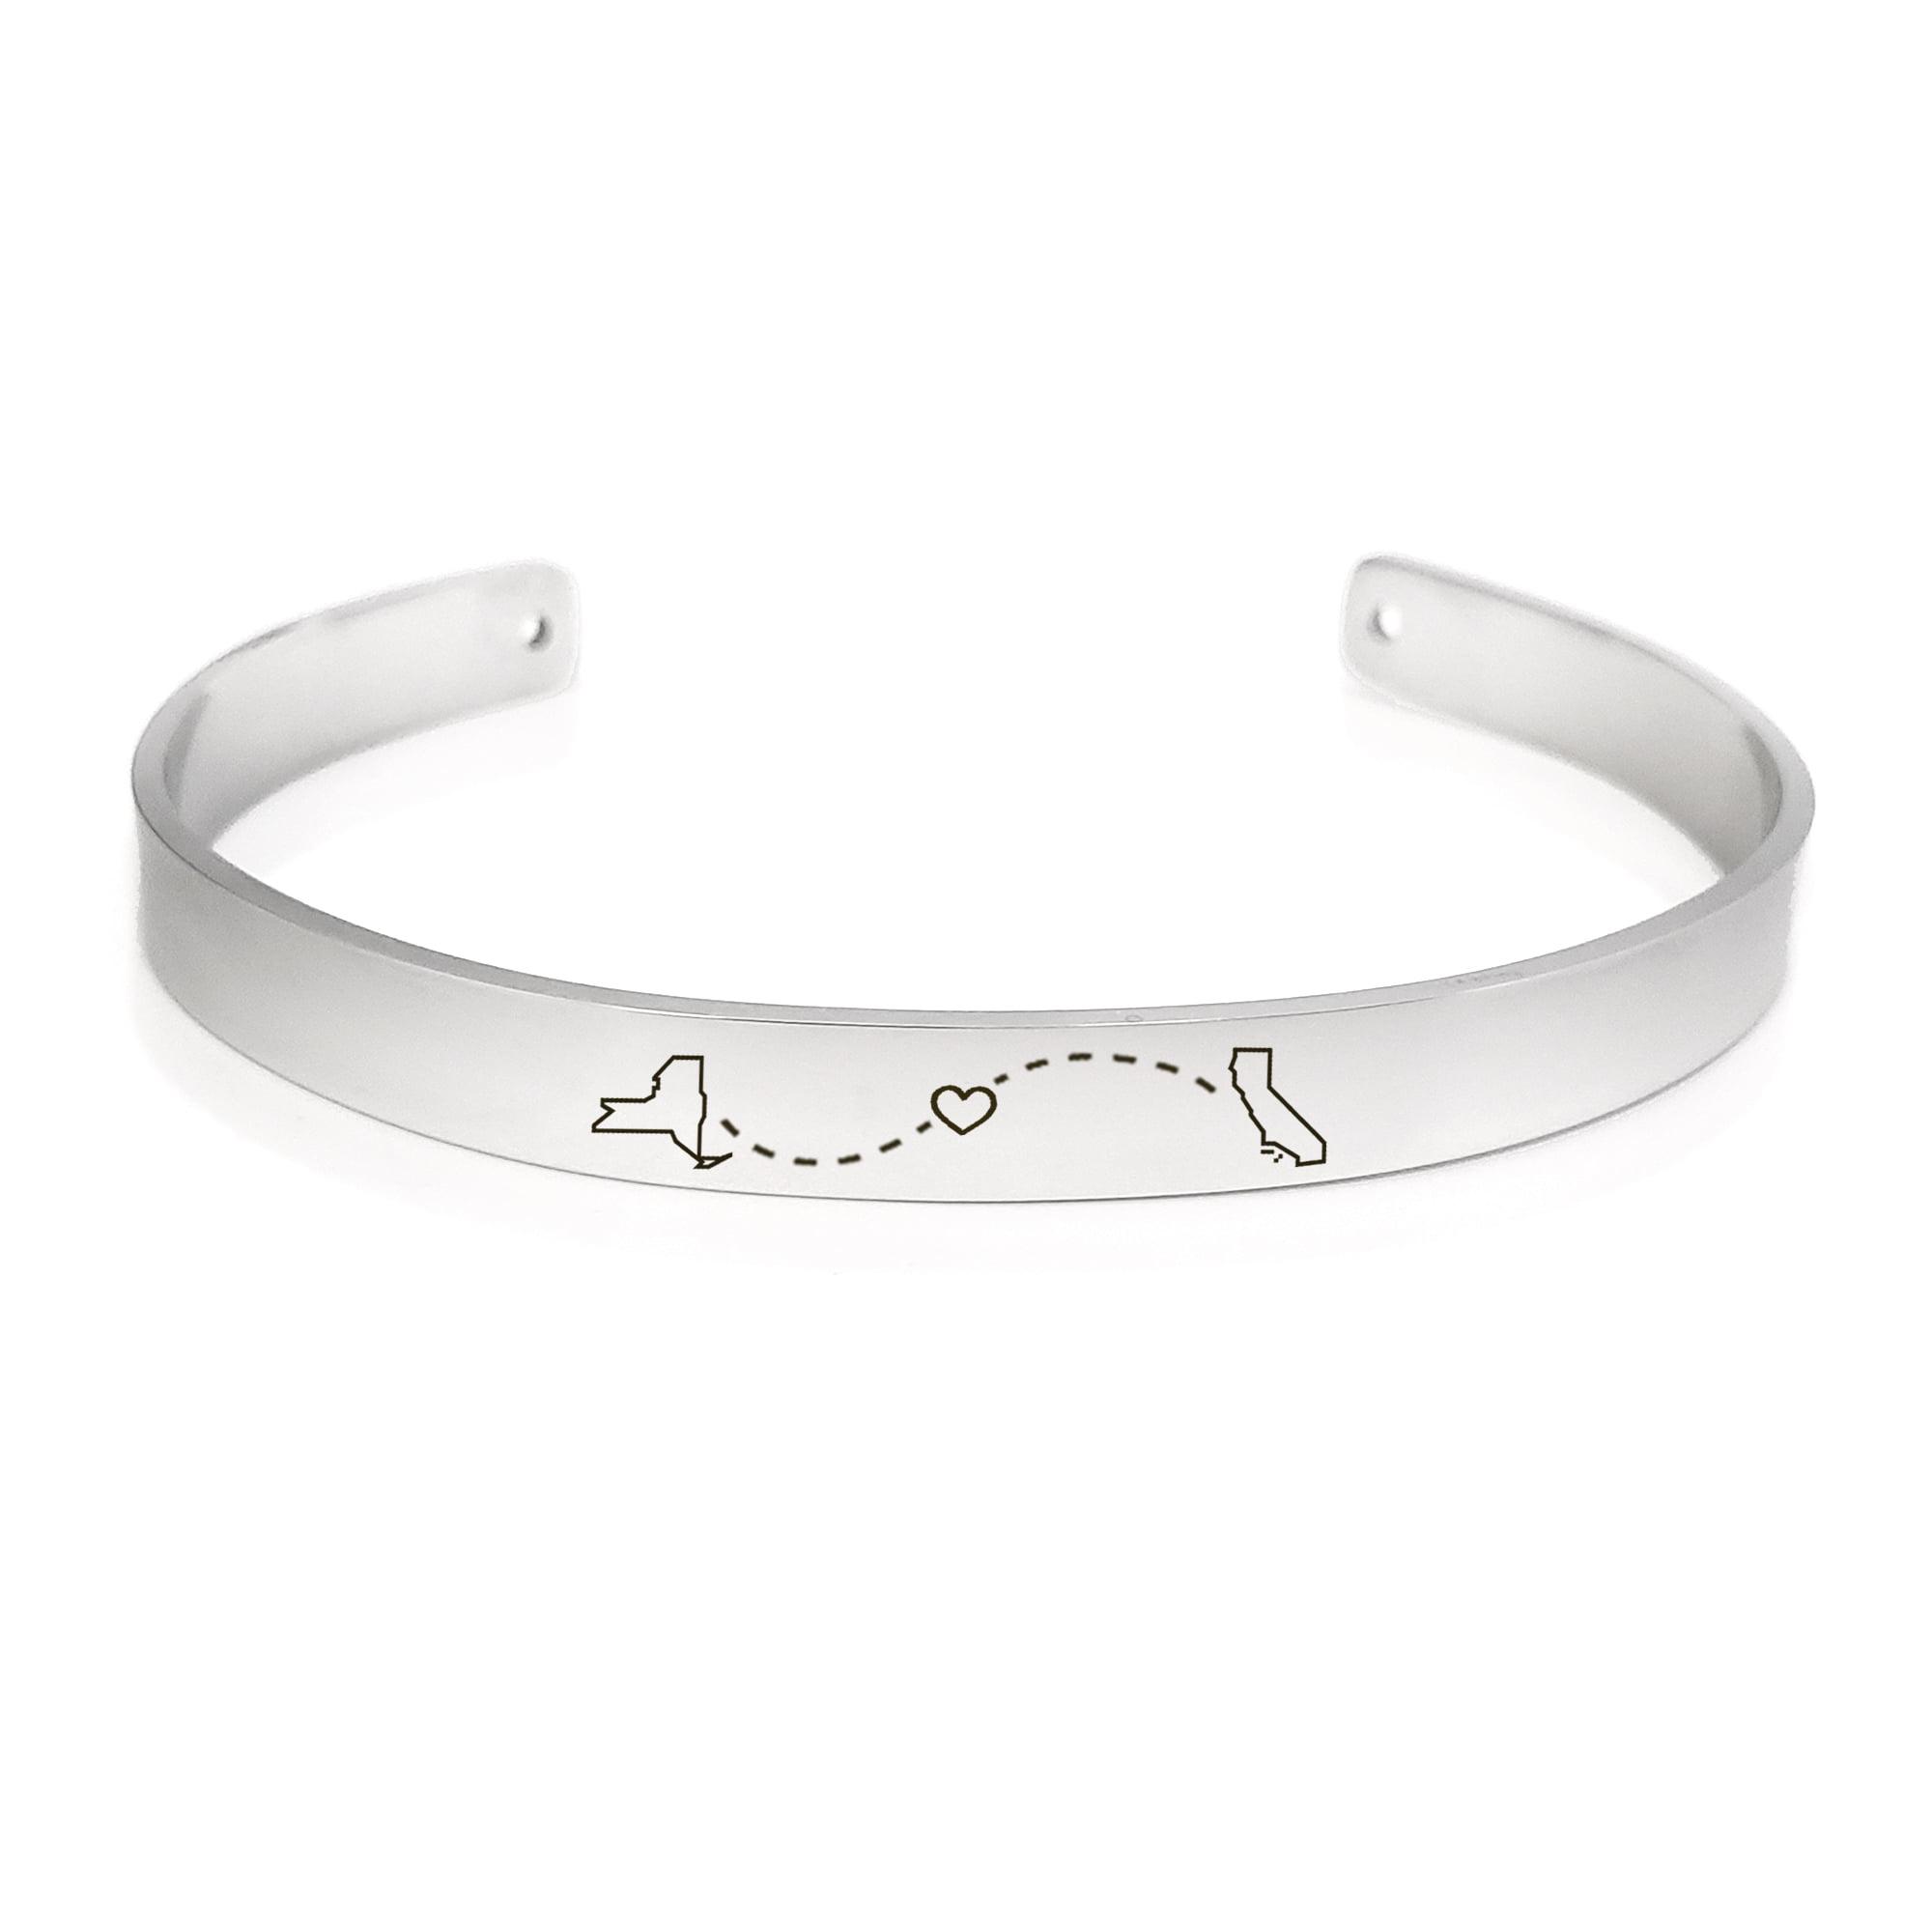 Personalized Heart Cuff,Personalized Bracelet,Cuff,Initial Bracelet,Monogram Bracelet,Silver Cuff Bracelet,Bracelet,Heart Bracelet,Love